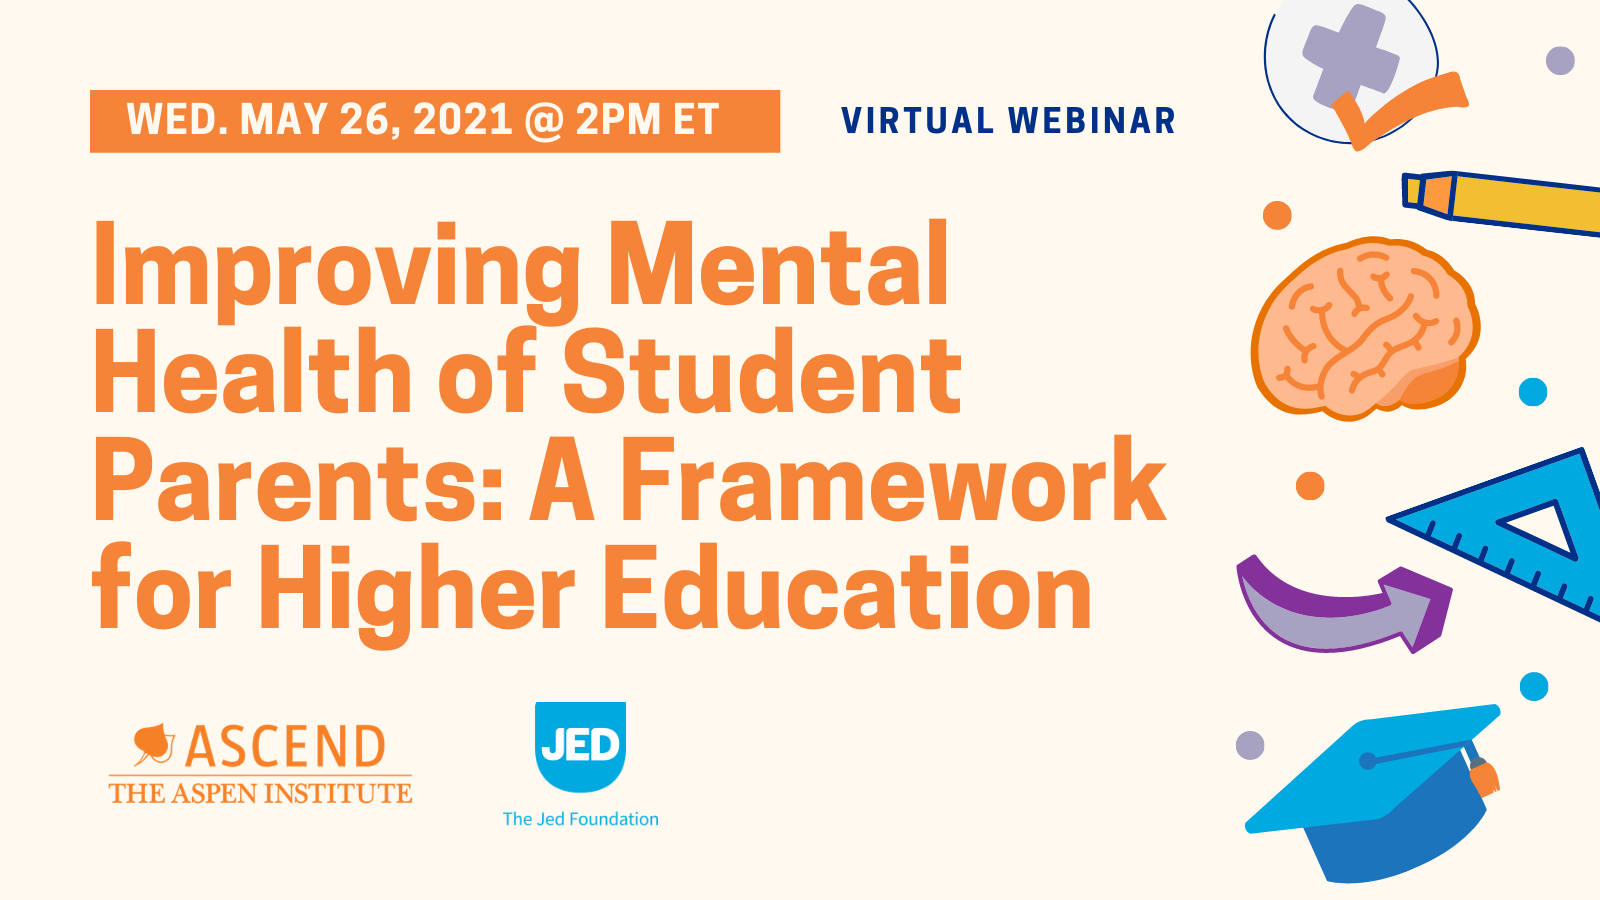 Improving Mental Health of Student Parents Webinar